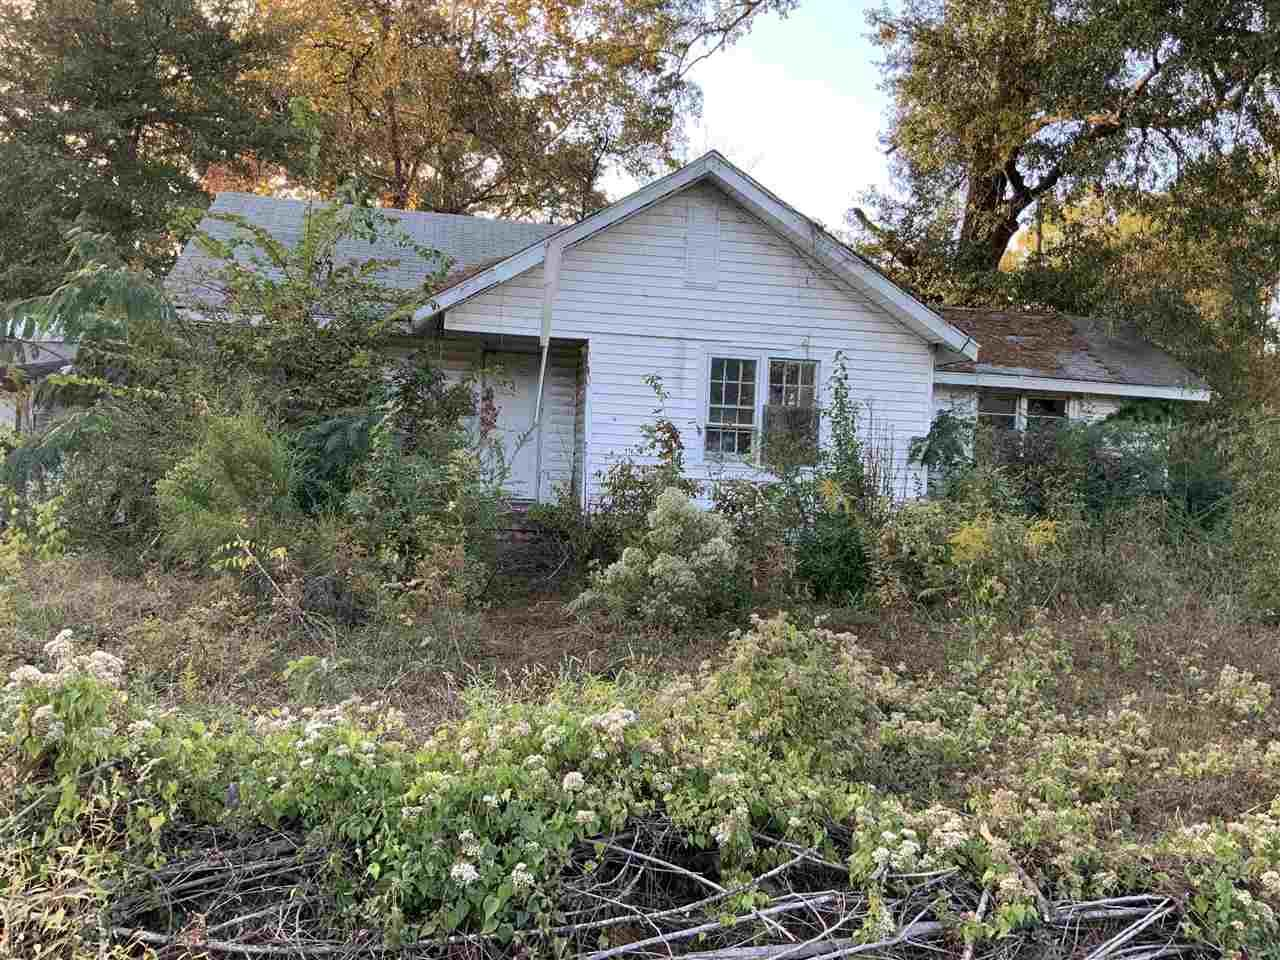 503 HOLDEN ST, Jackson, MS 39209 - MLS#: 335907